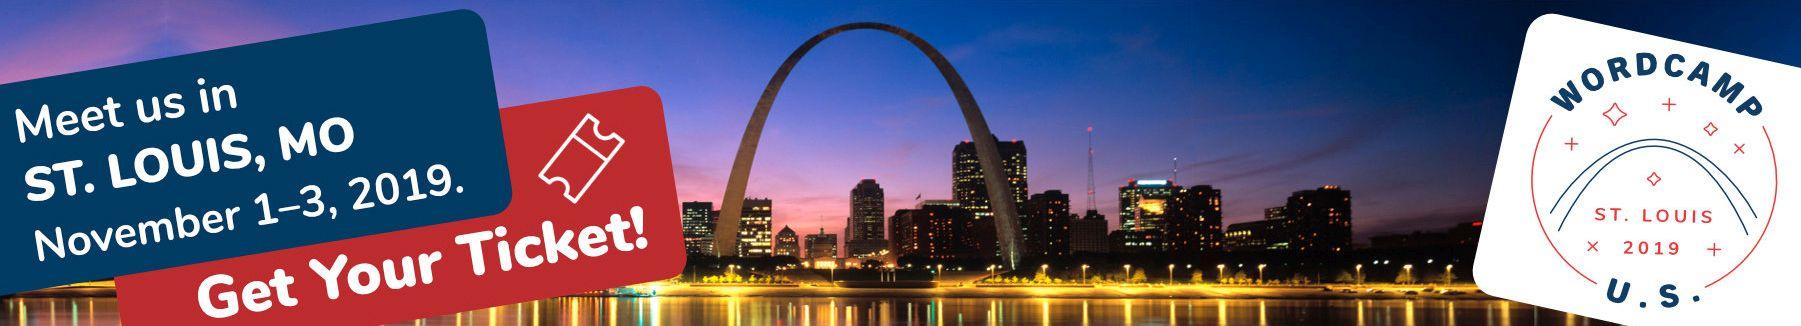 WordCamp US 2019 in St. Louis, Missouri